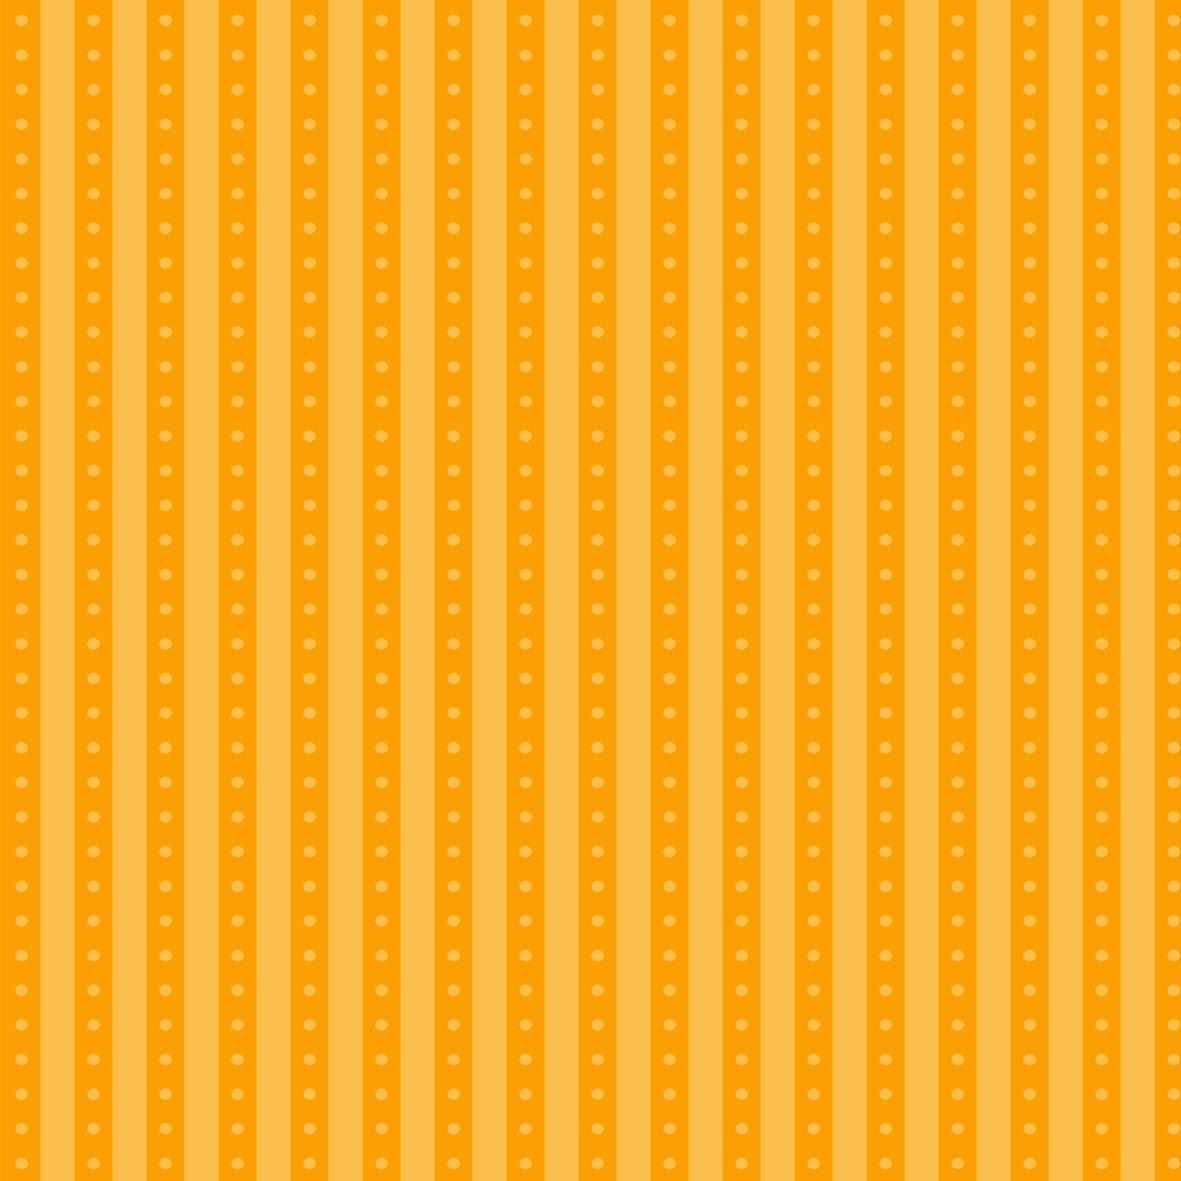 Fondo naranja.